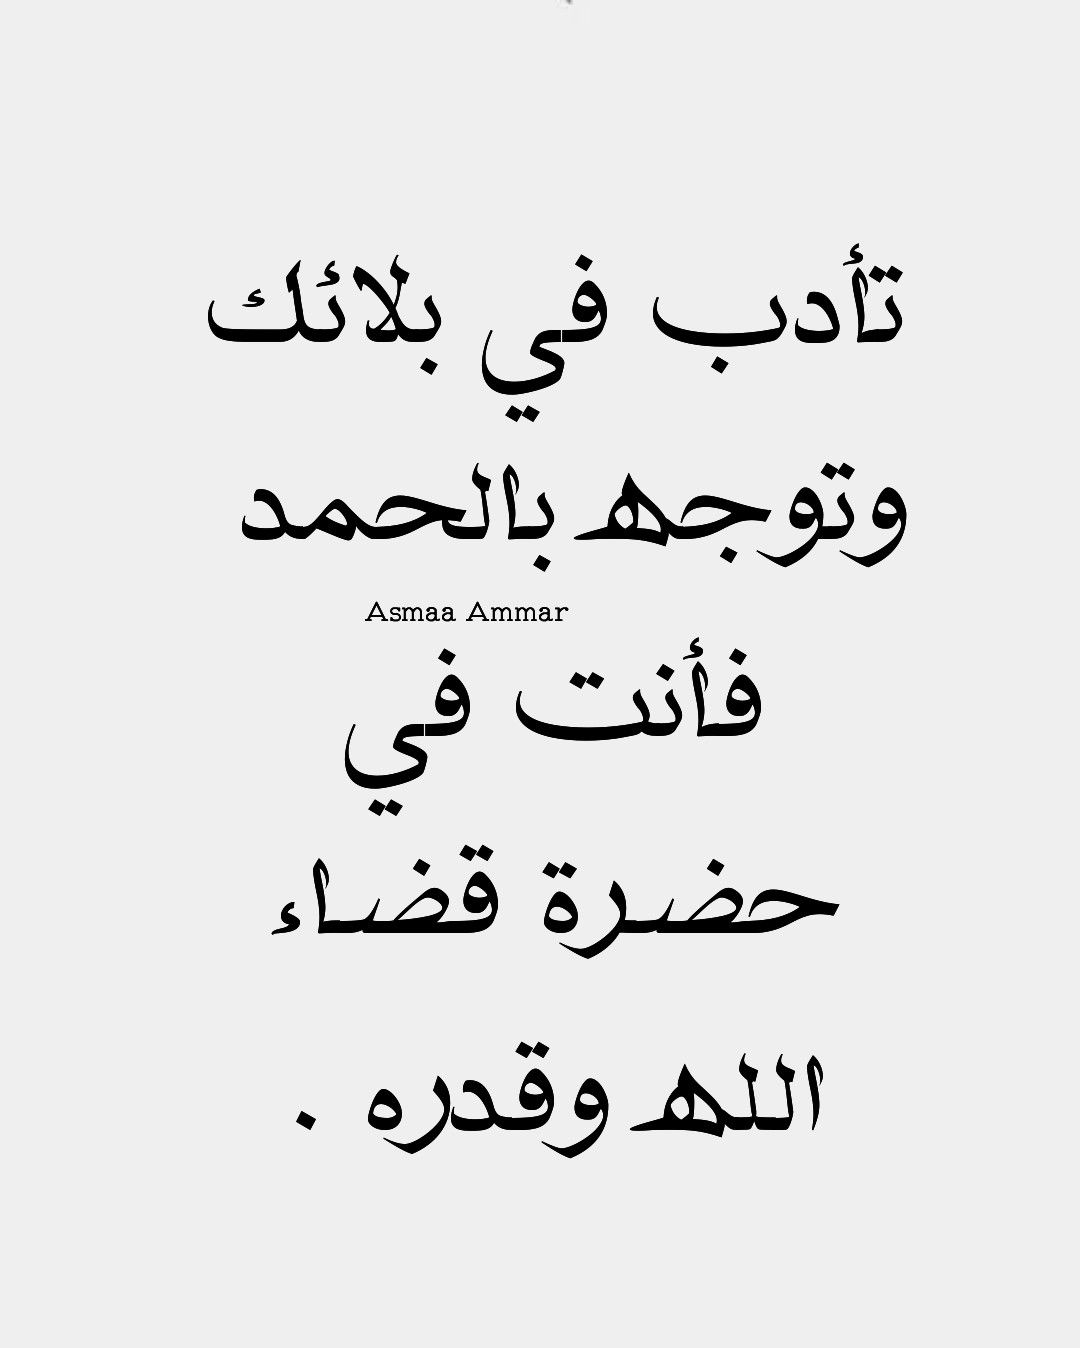 Pin By Asmaa Ammar On اسلاميات Arabic Calligraphy Spirituality Calligraphy